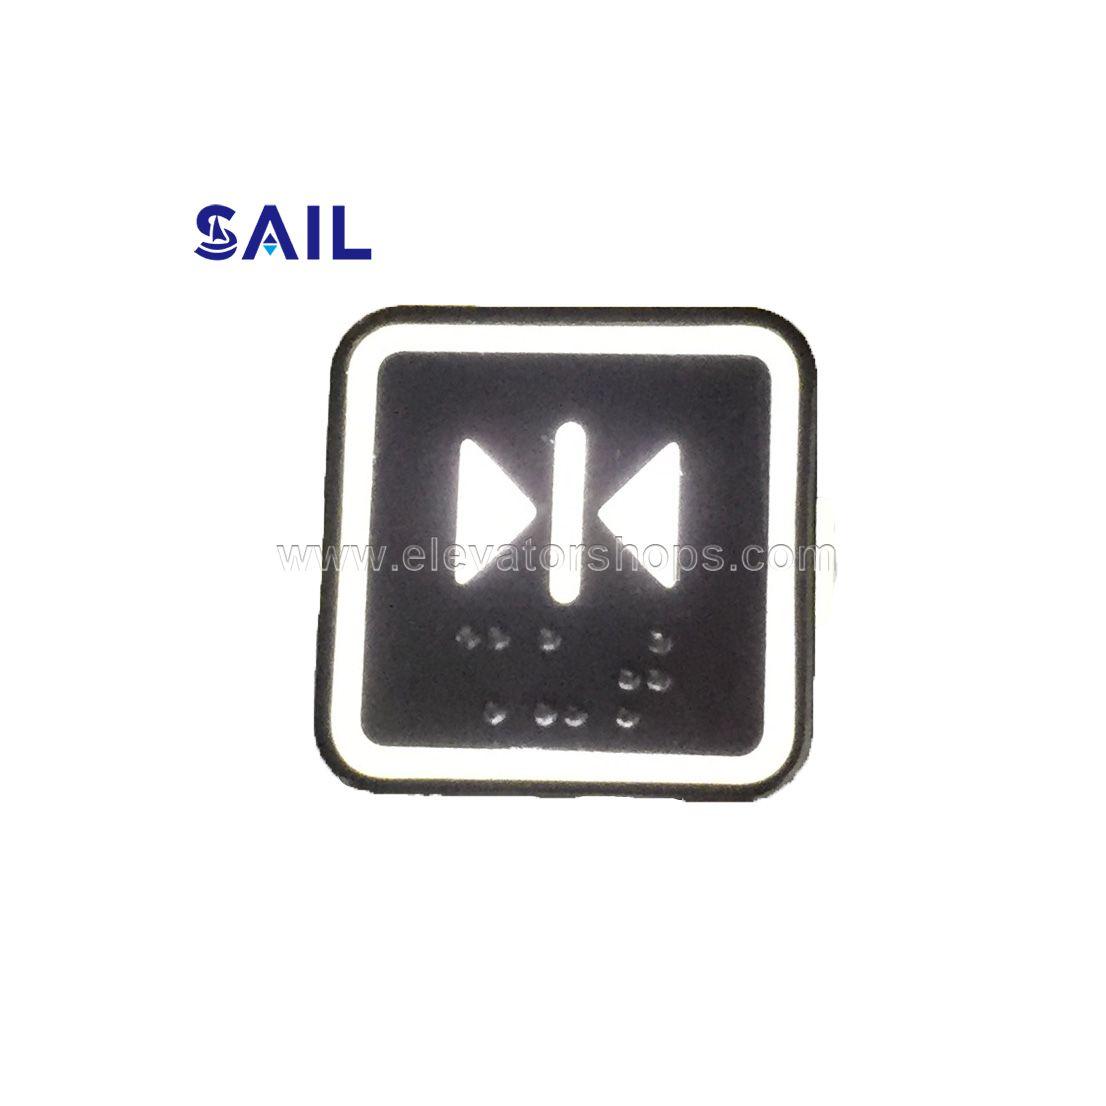 Thyssen Elevator Square Push Button KA302